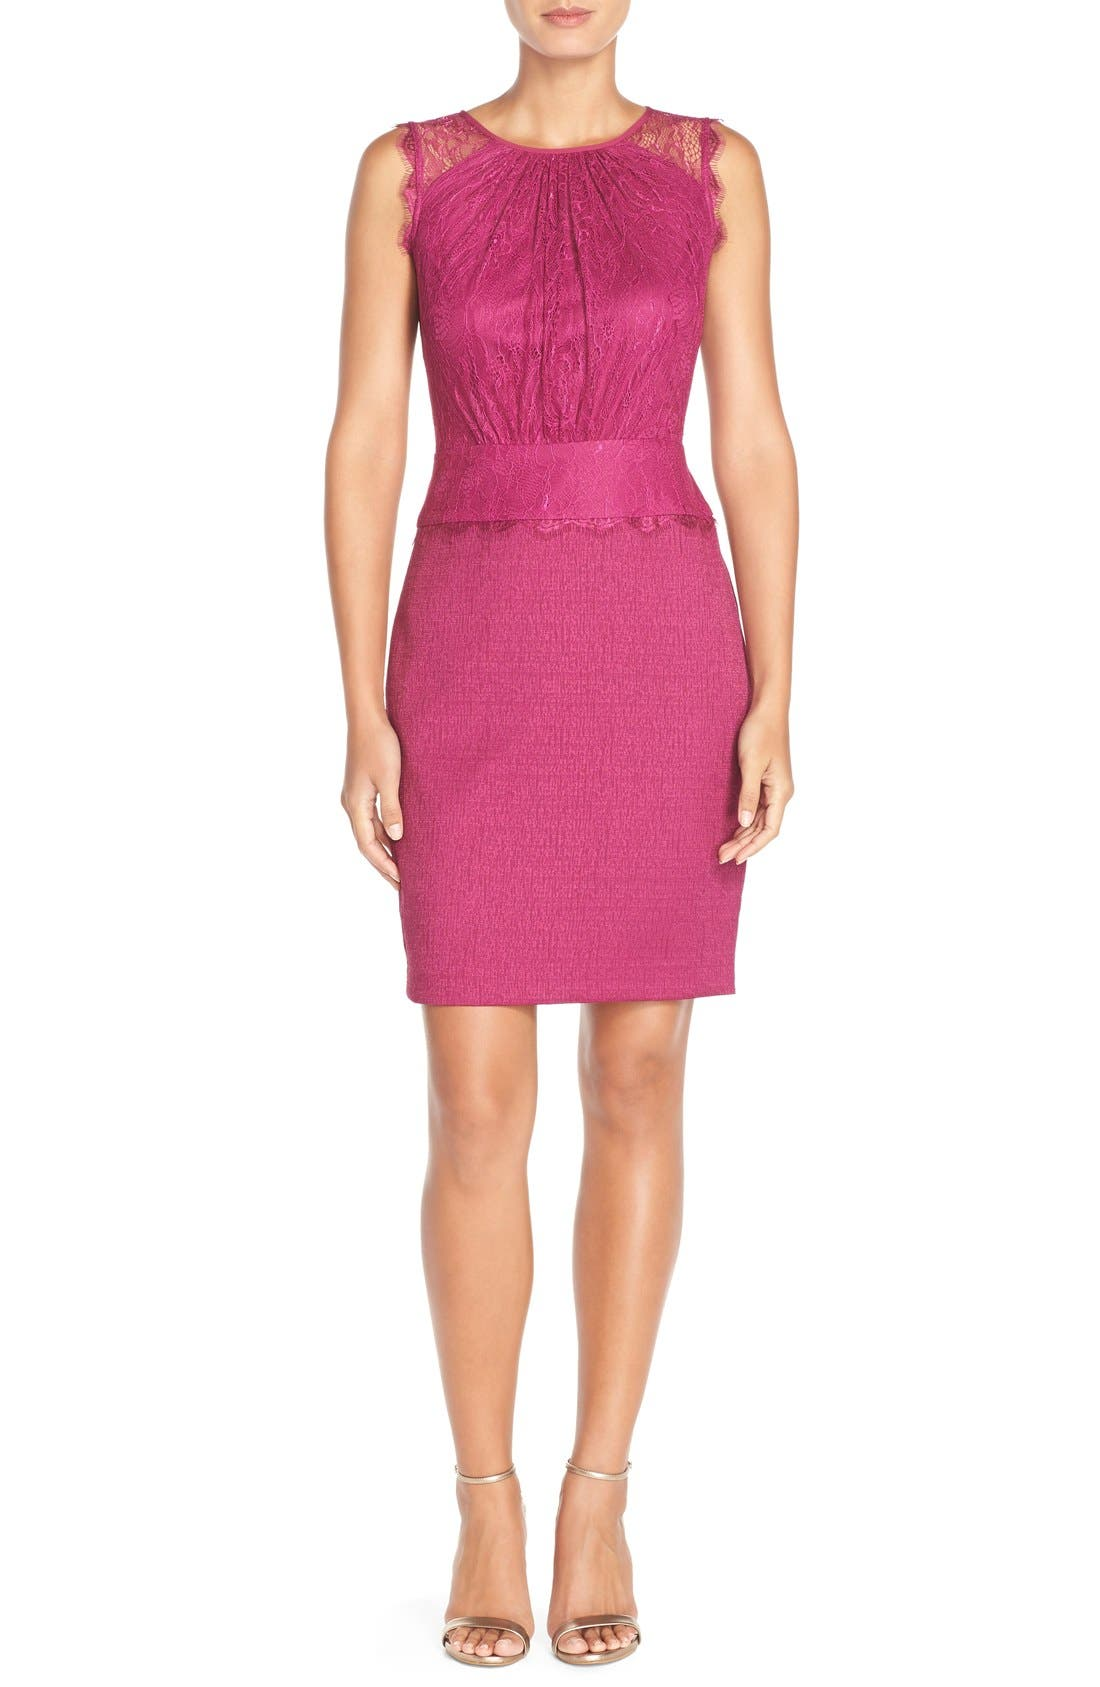 Main Image - Adrianna Papell Lace & Jacquard Blouson Dress (Regular & Petite)